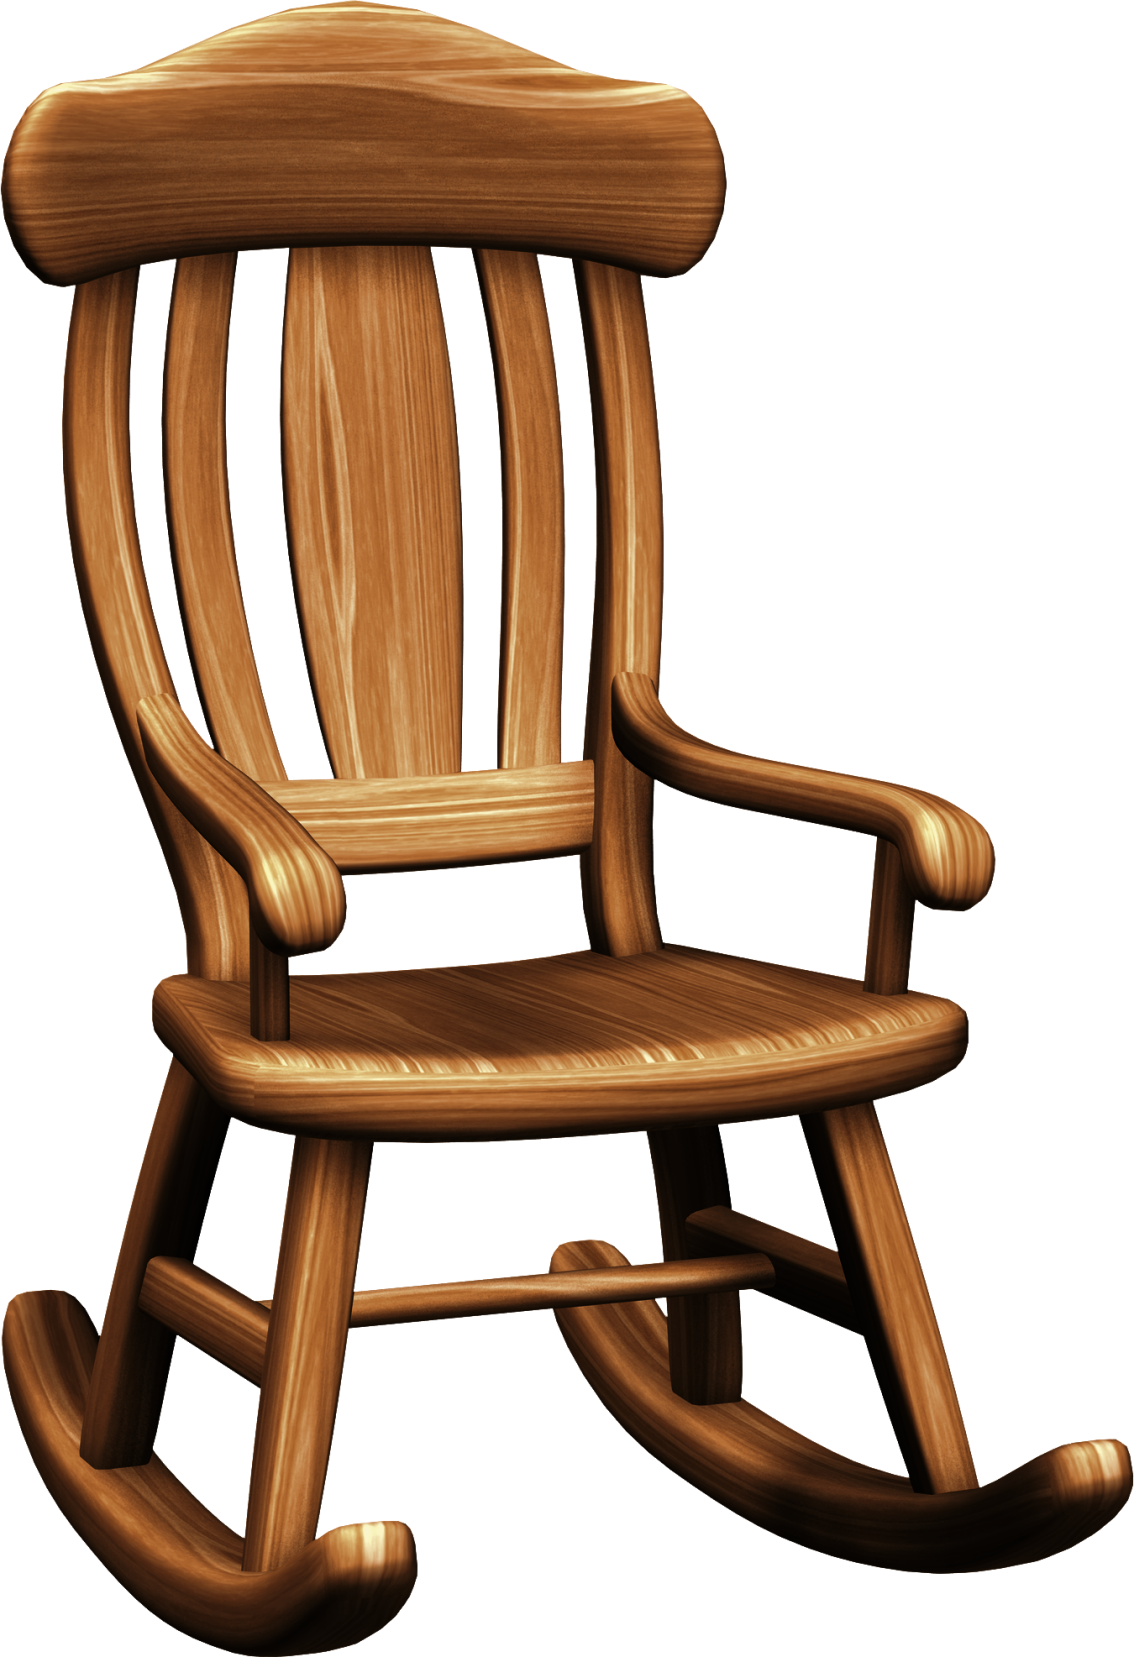 Swing Chair Transparent Best Video Game Chairs MÓveis E Objetos Da Casa